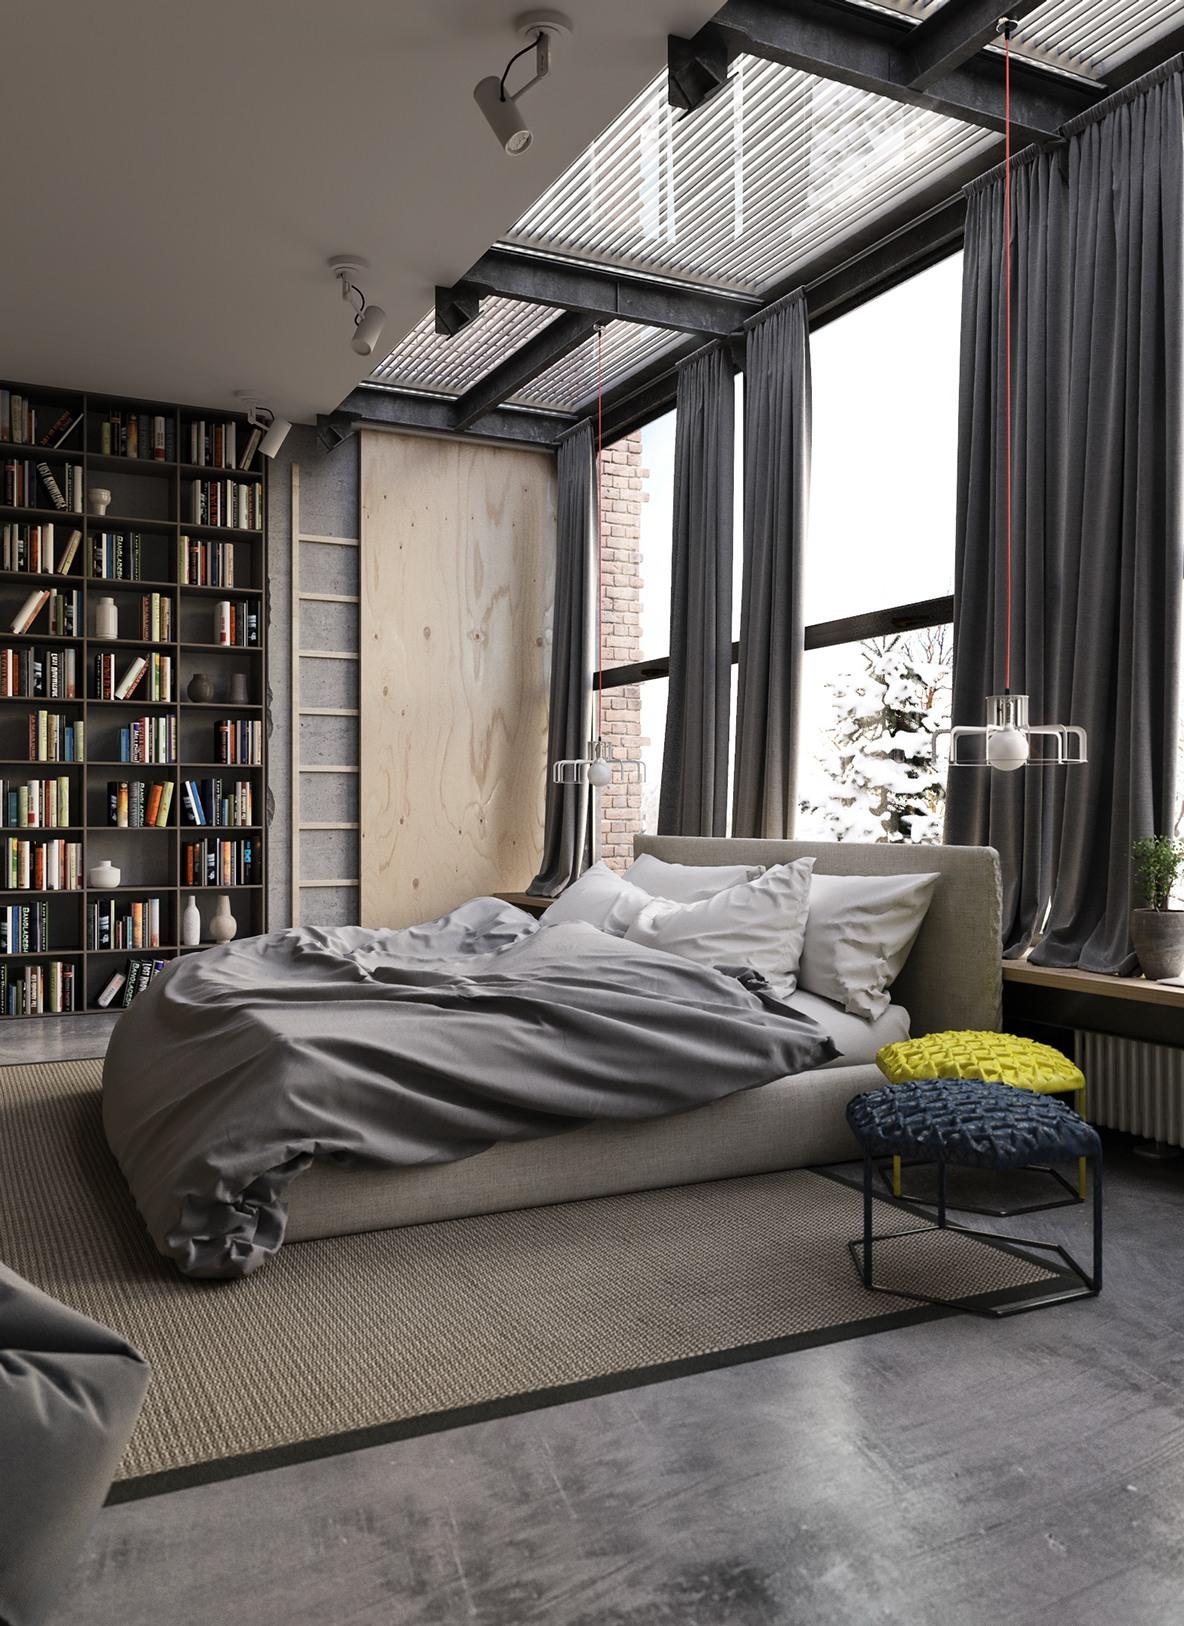 gray-industrial-bedroom-decor